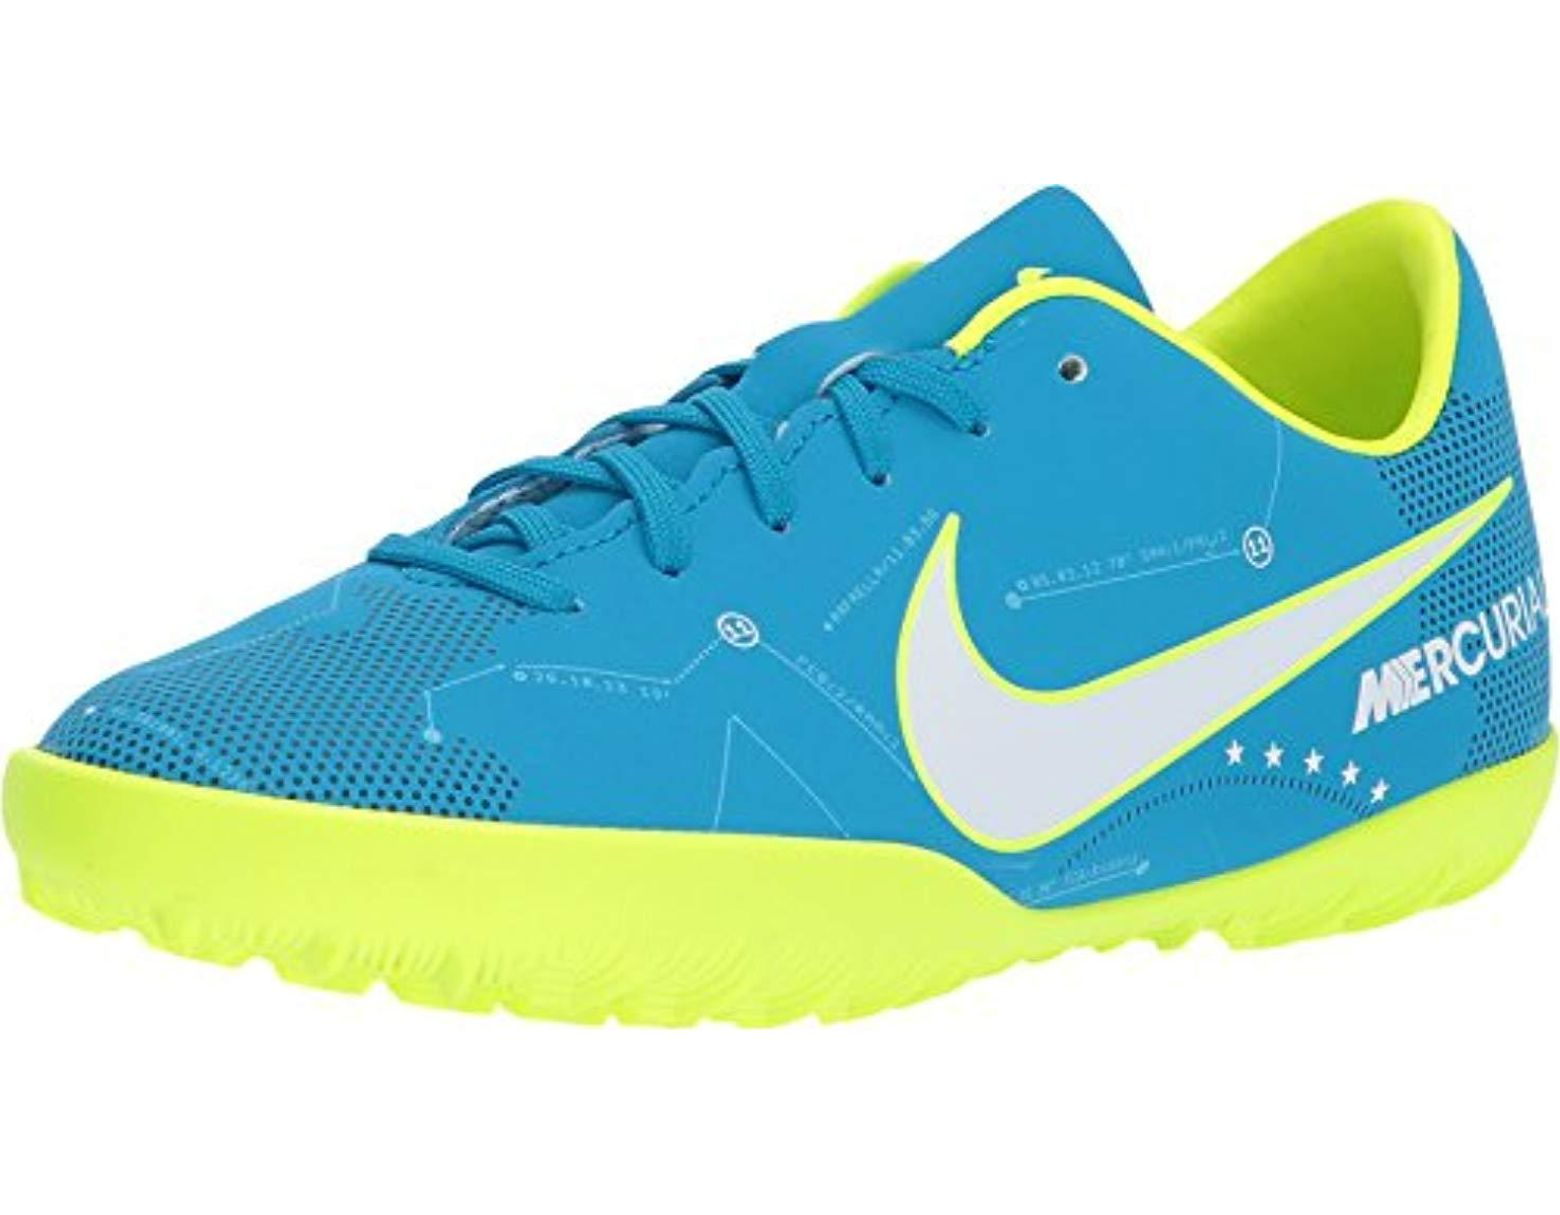 0bb3195d82436 Men's Mercurialx Victory 6 Neymar Jr Turf Soccer Shoes-blue Size: 3y